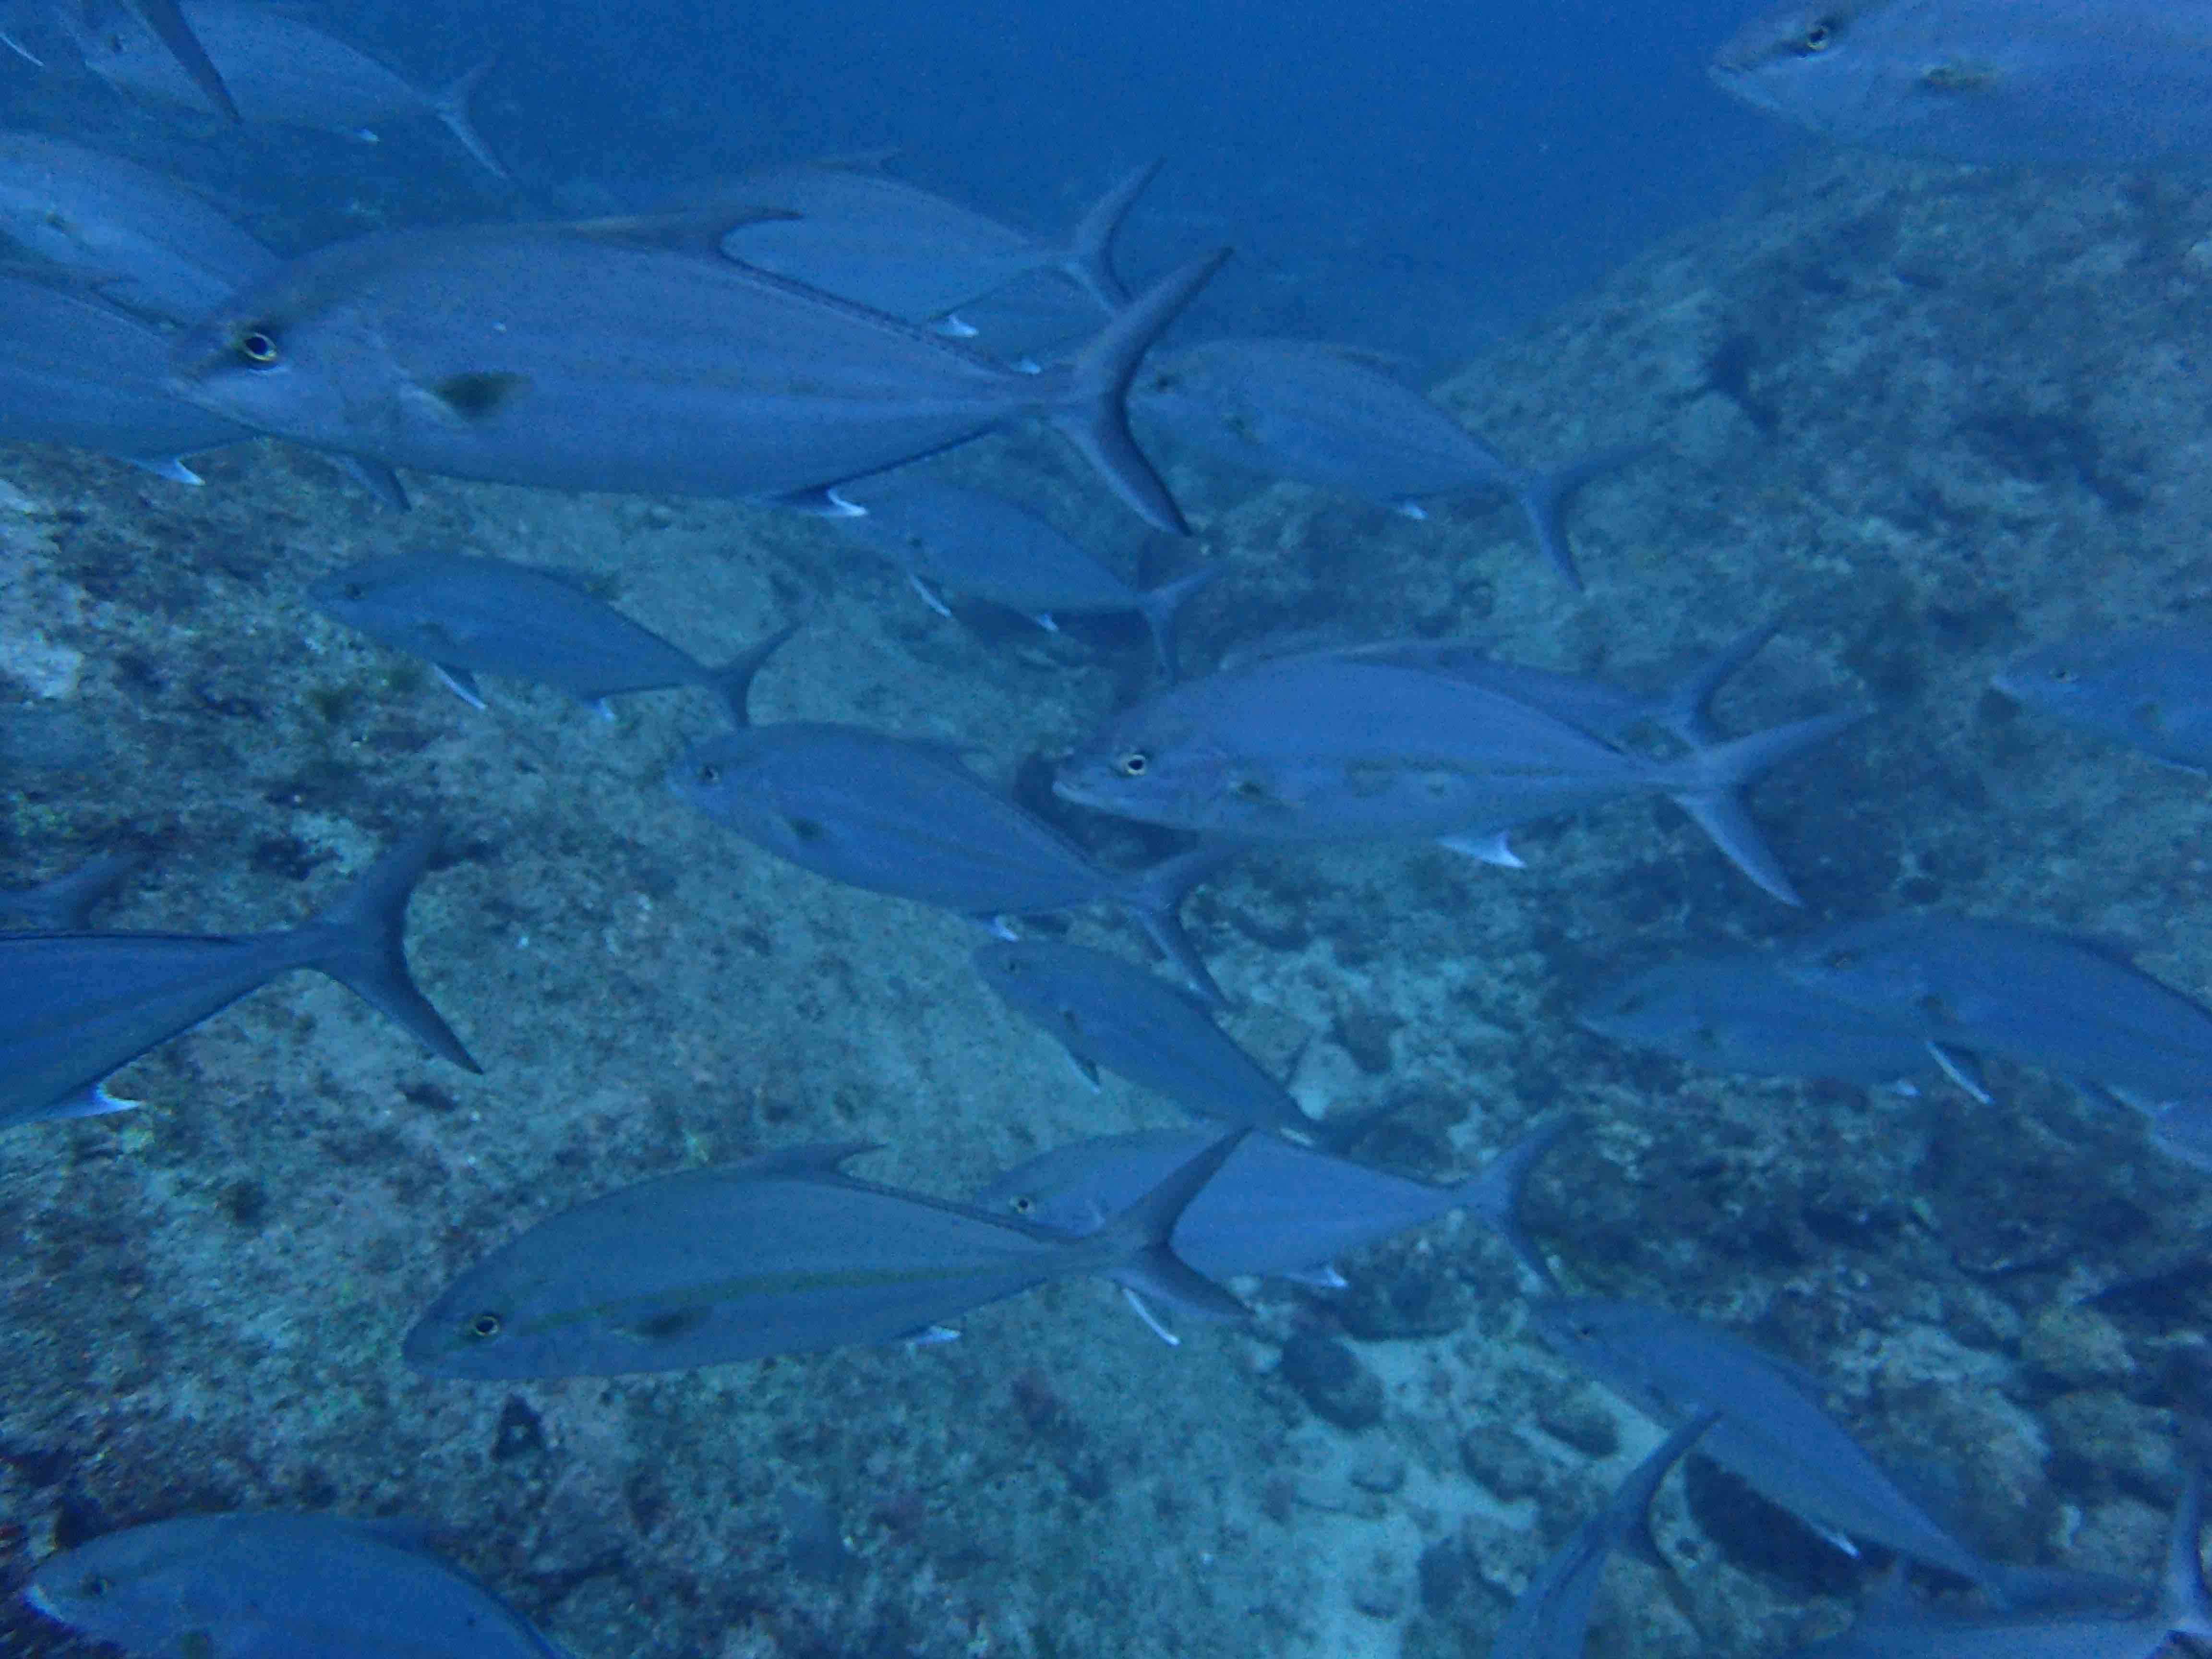 http://www.aquamarine-dive.net/blog/index.html/2015/05/06/P5060023_1.jpg